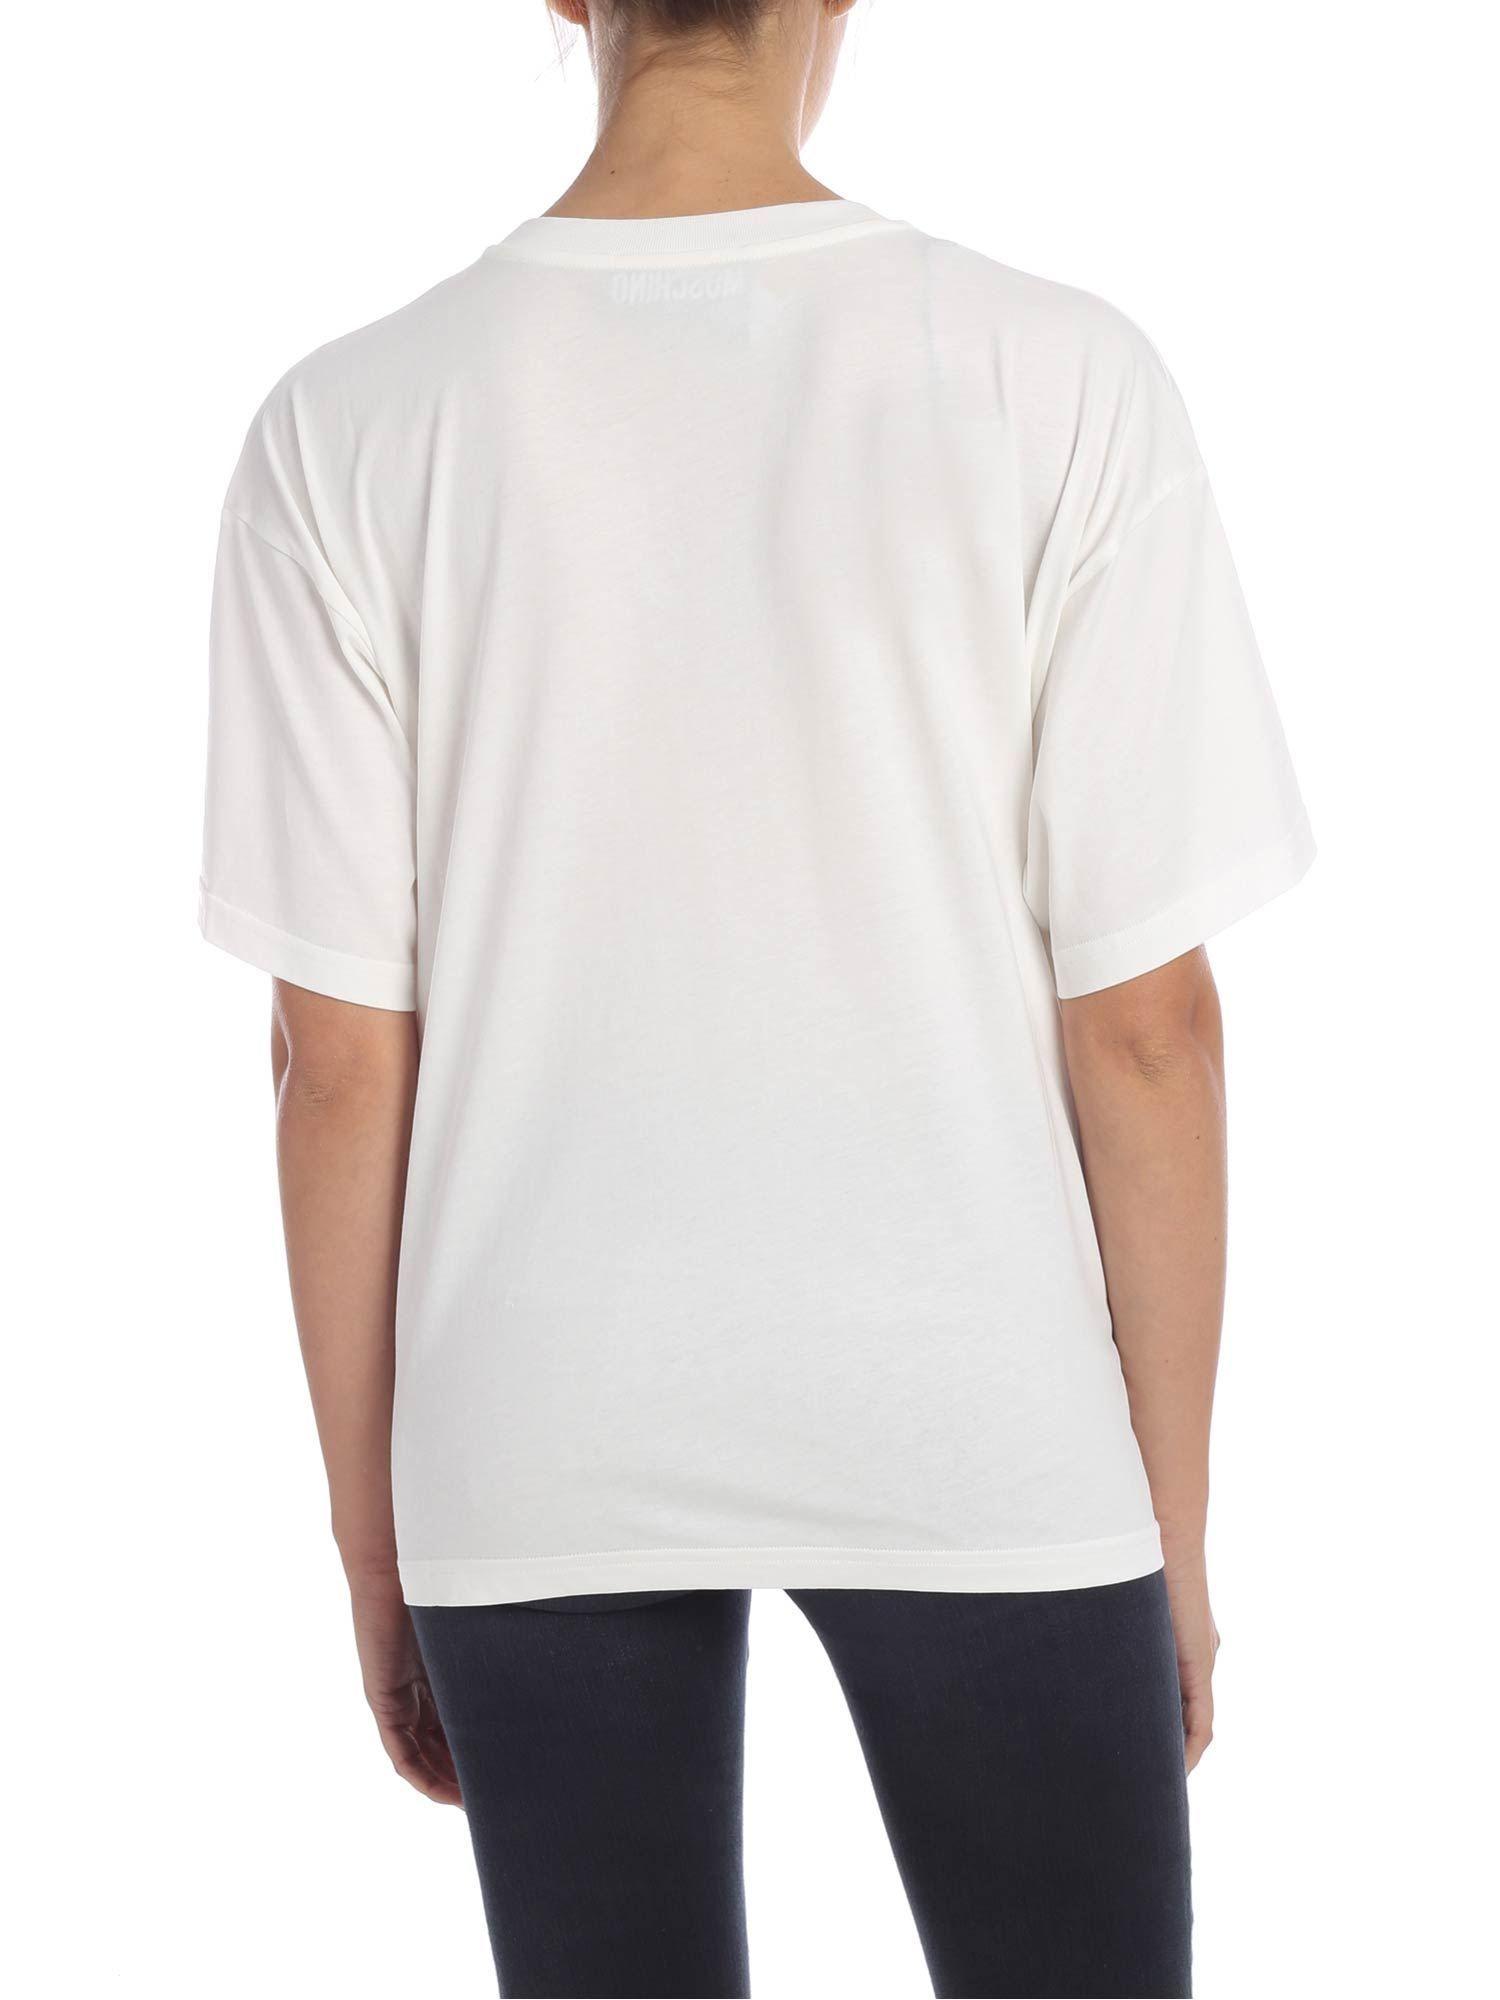 MOSCHINO WOMEN'S J071254403002 WHITE COTTON T-SHIRT